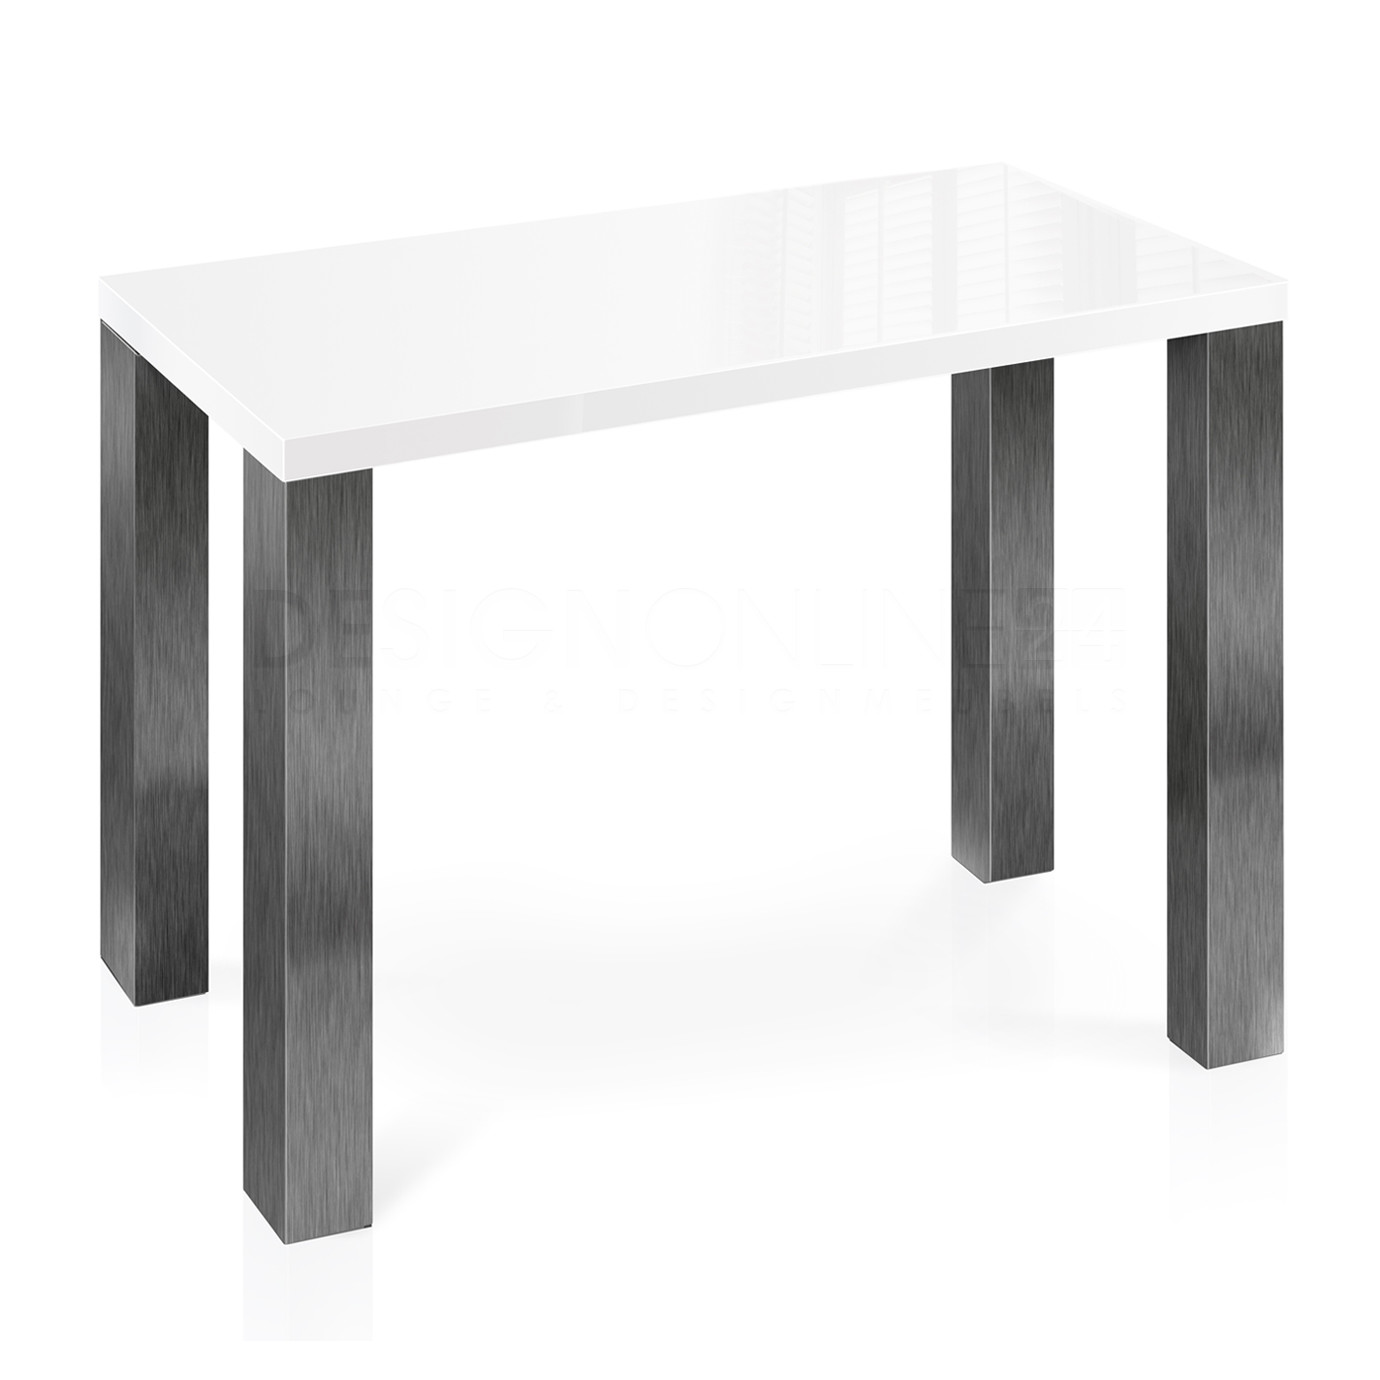 Hoogglans Keuken Krassen : Image 24designs Bartafel 135 X 70 X 92 Cm – High Gloss Wit – Rvs